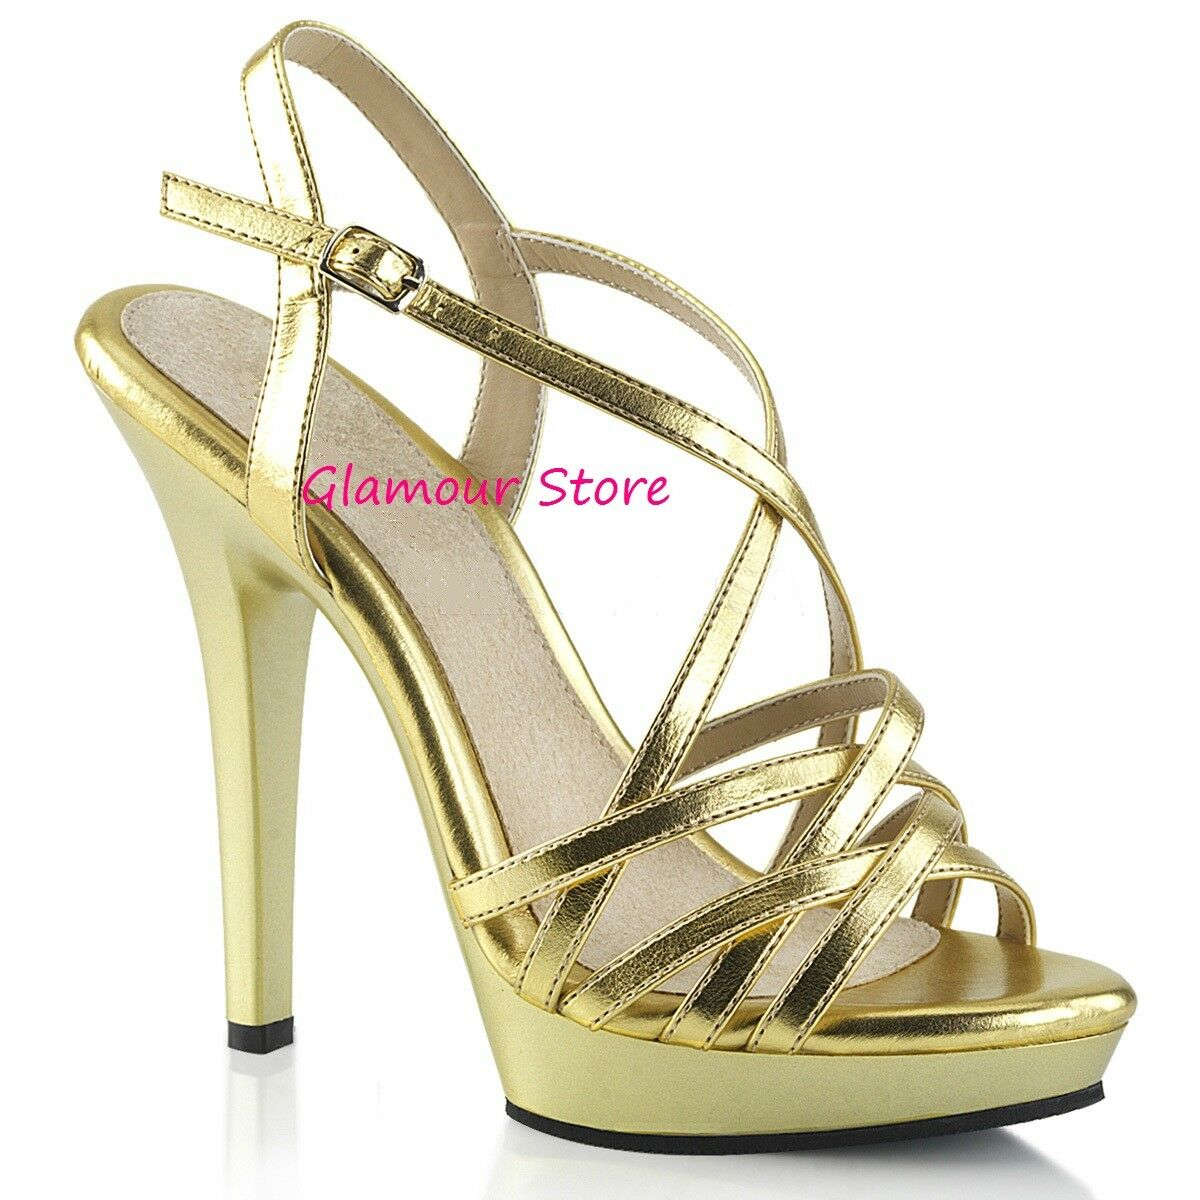 Sexy SANDALI tacco 13 dal 35 al 42 plateau plateau plateau 5 ColoreeeI cinturino scarpe GLAMOUR | Credibile Prestazioni  1bd6cf